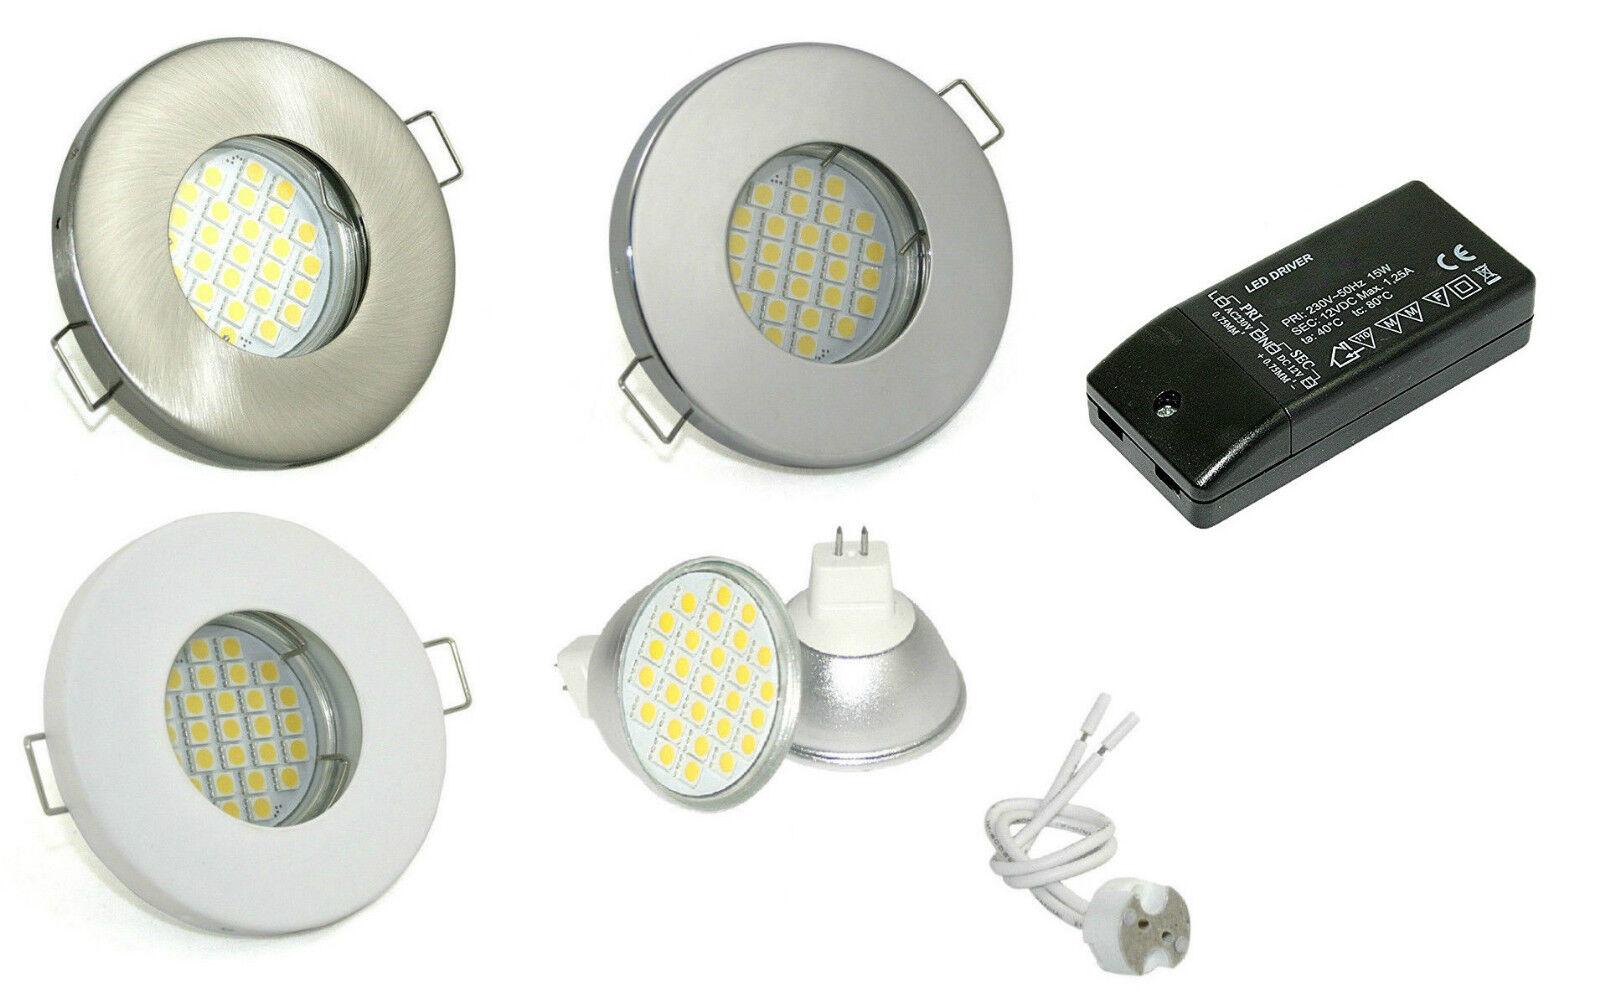 Einbaustrahler Set Bad & Dusche Feuchtraum 12V MR16 Trafo LED Einbaurahmen Spot